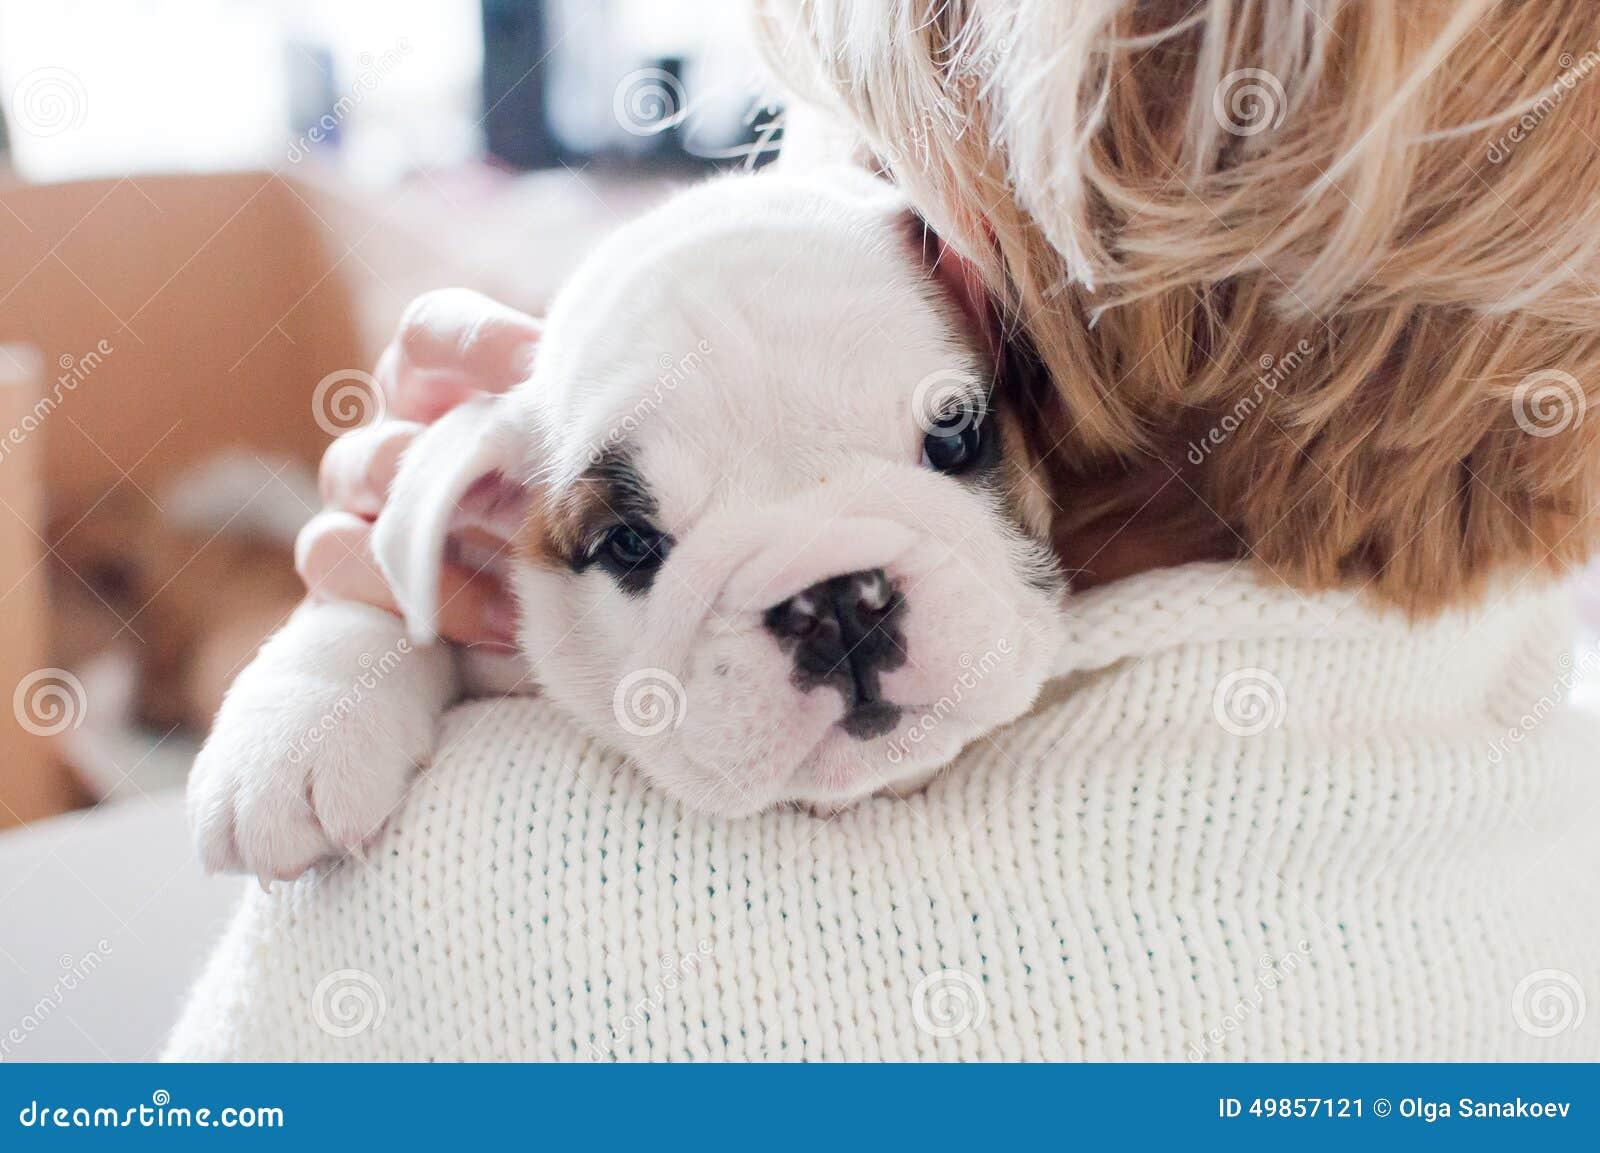 Woman Holding White English Bulldog Puppy Stock Image